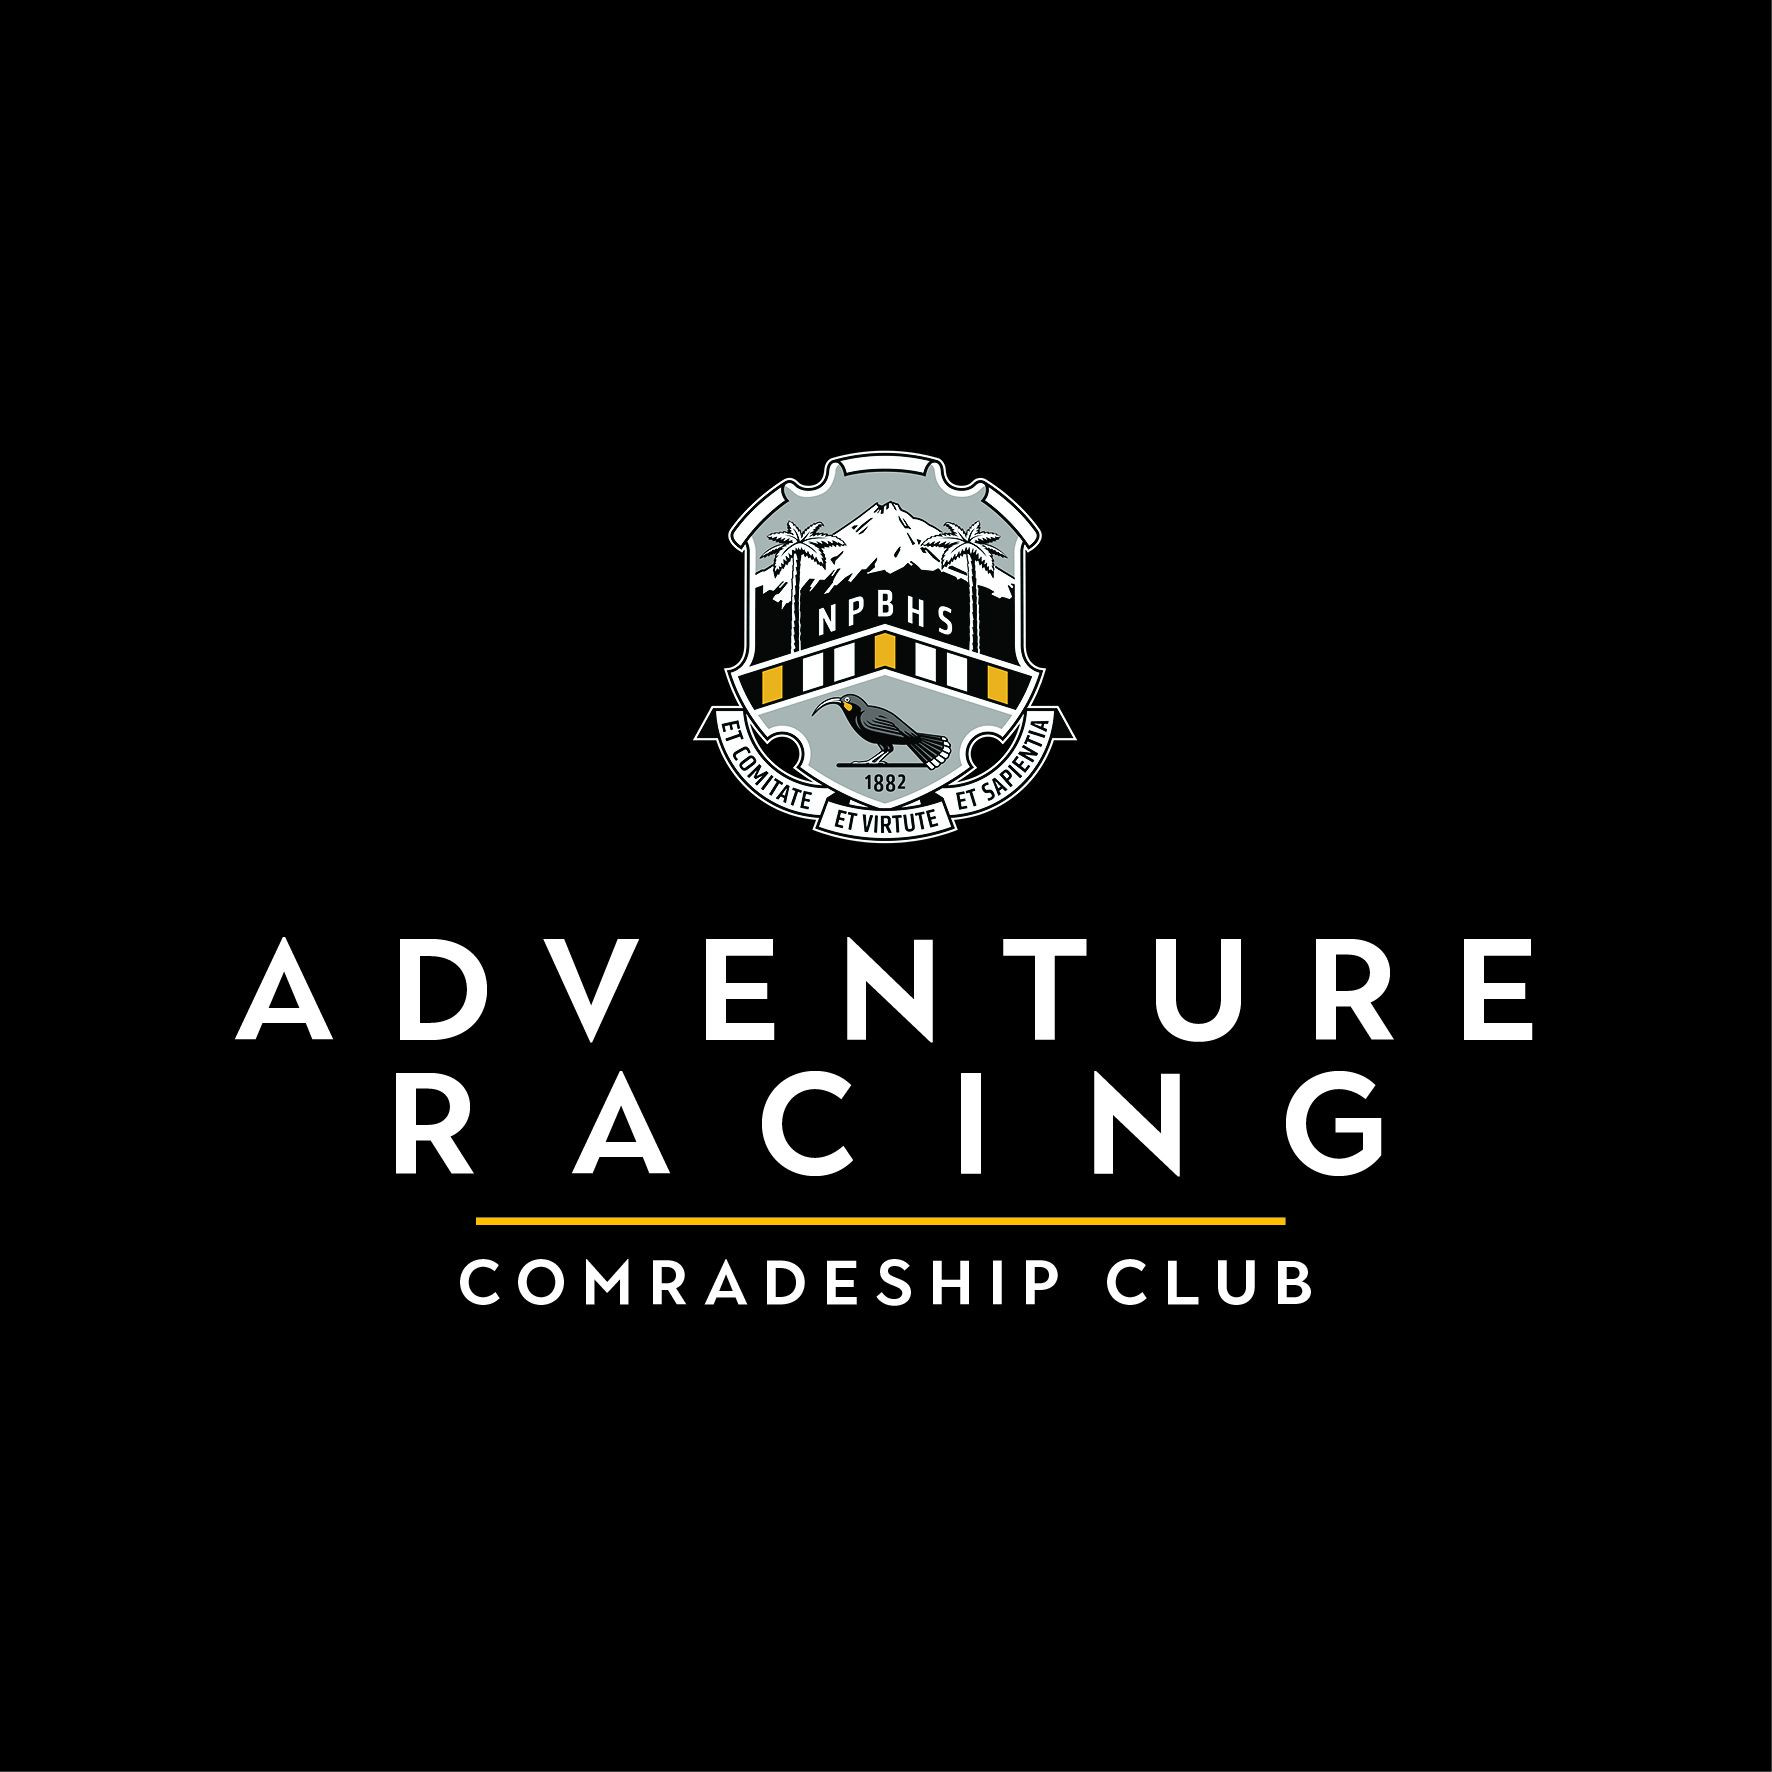 Adventure Racing Comradeship Club